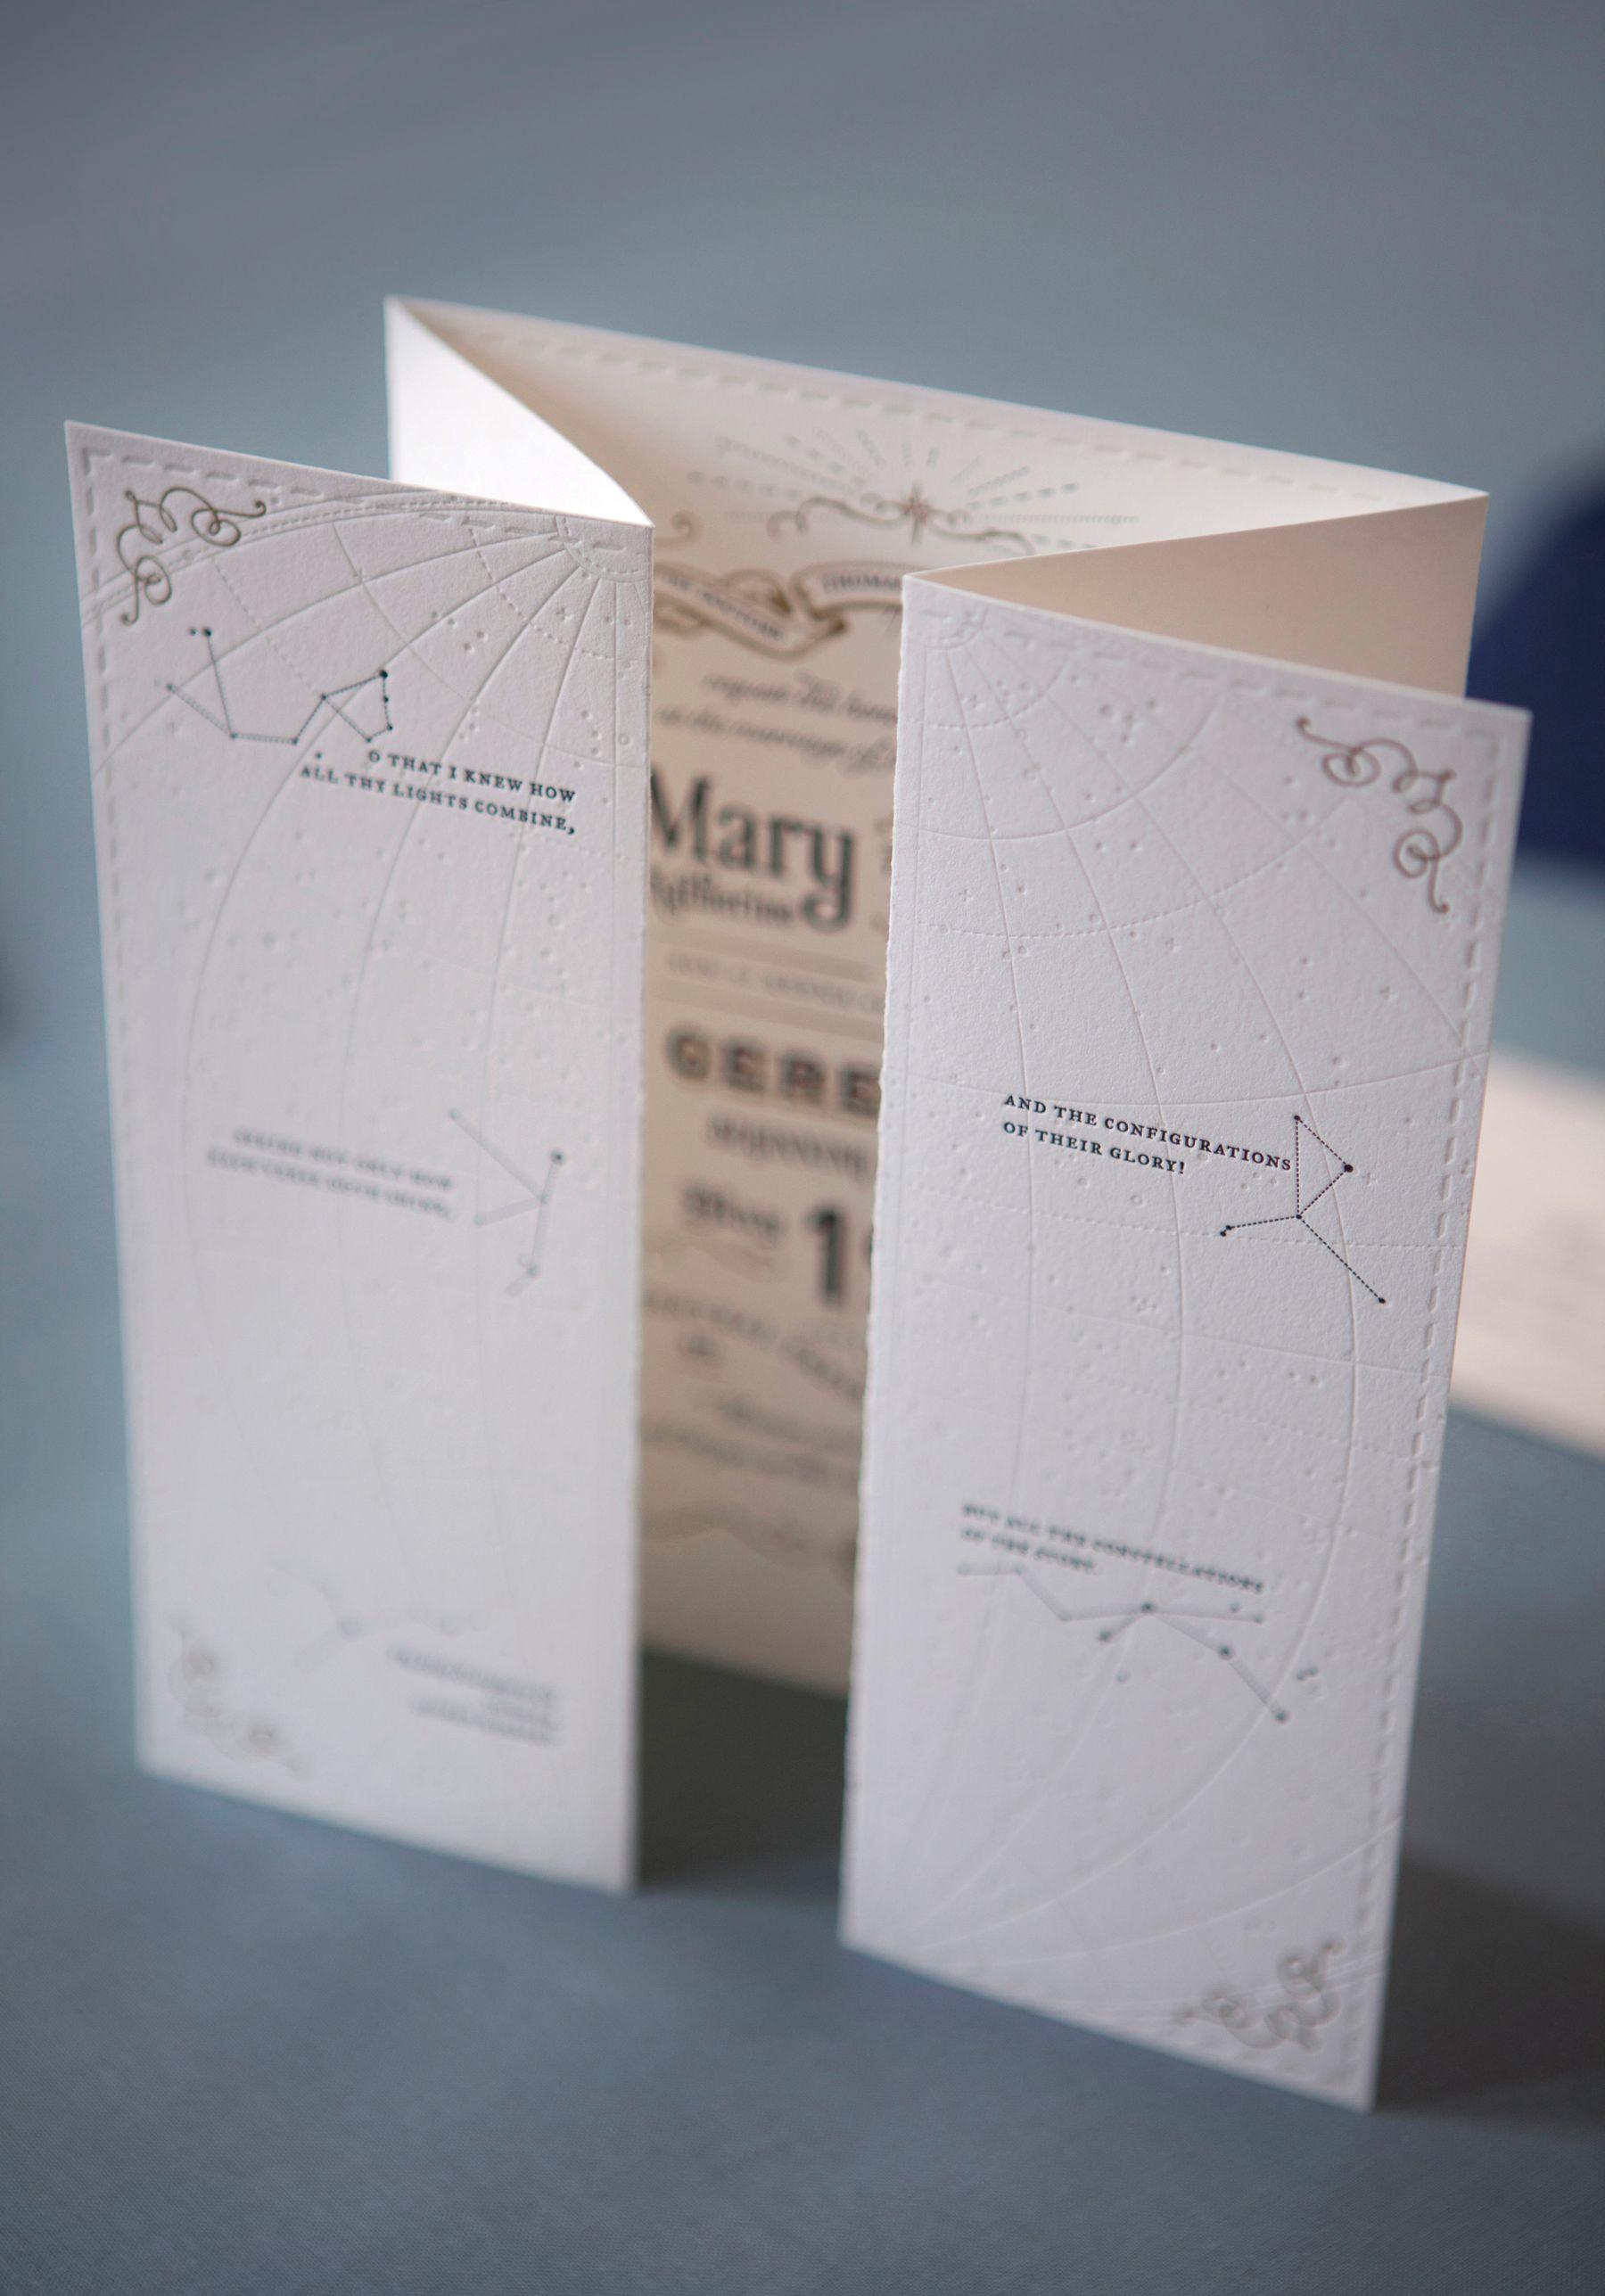 Print celebrates design weddings wedding and wedding stationary print celebrates design design competitionswedding stationarywedding invitationthemed stopboris Gallery